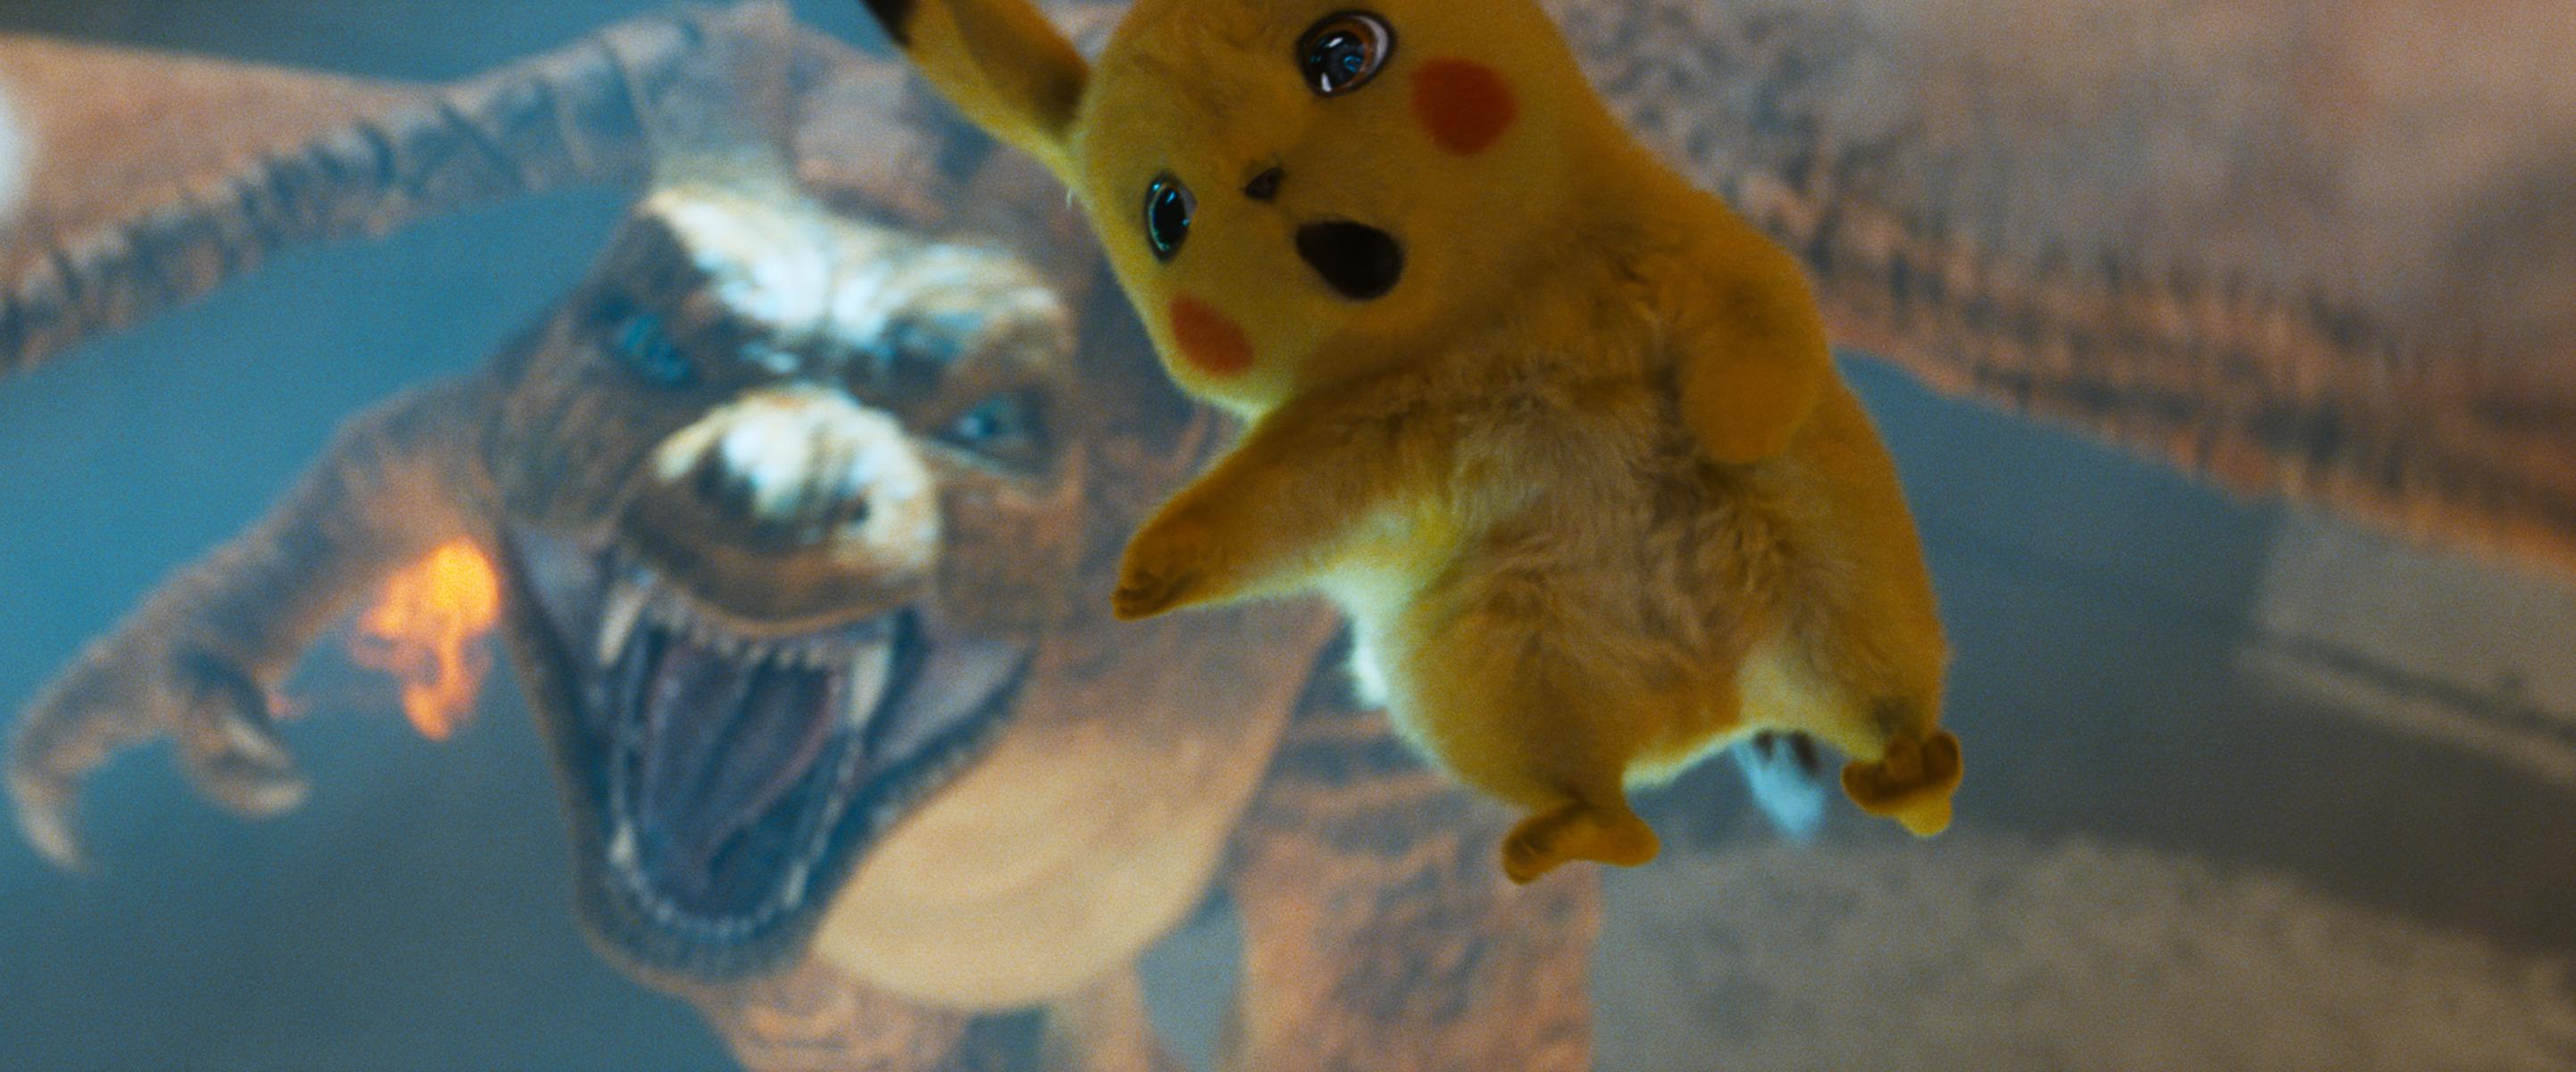 Ryan Reynolds in Pokémon: Detective Pikachu (2019)